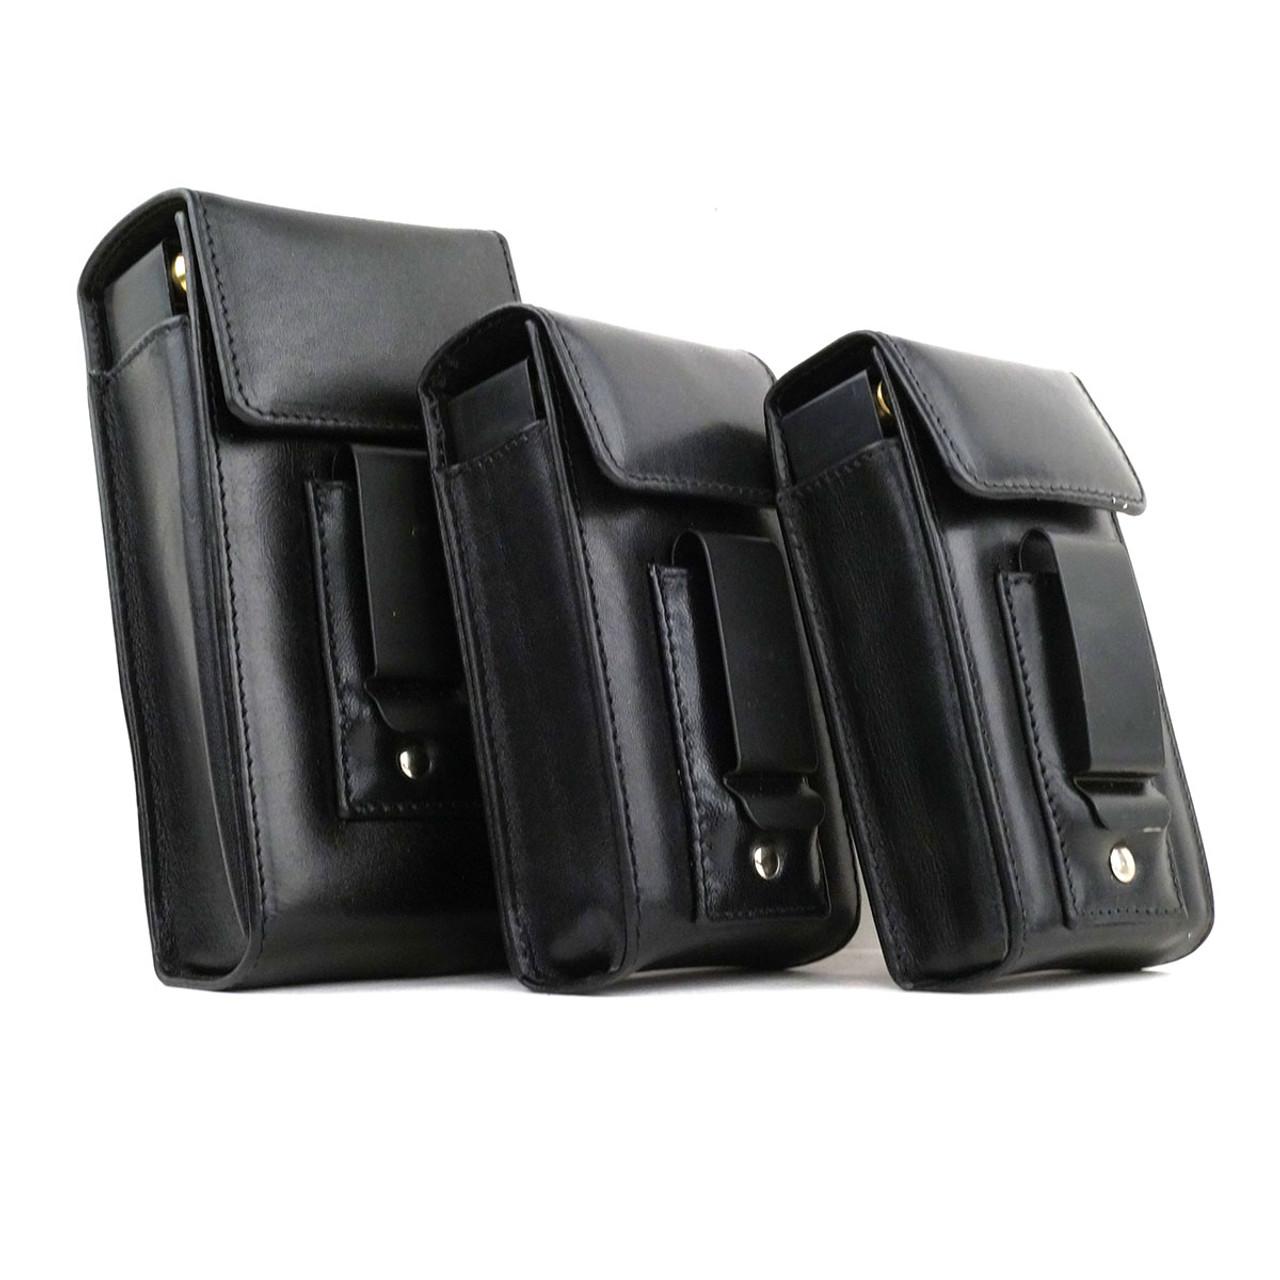 KelTec P3AT Leather Arsenal 50 Round Belt Case